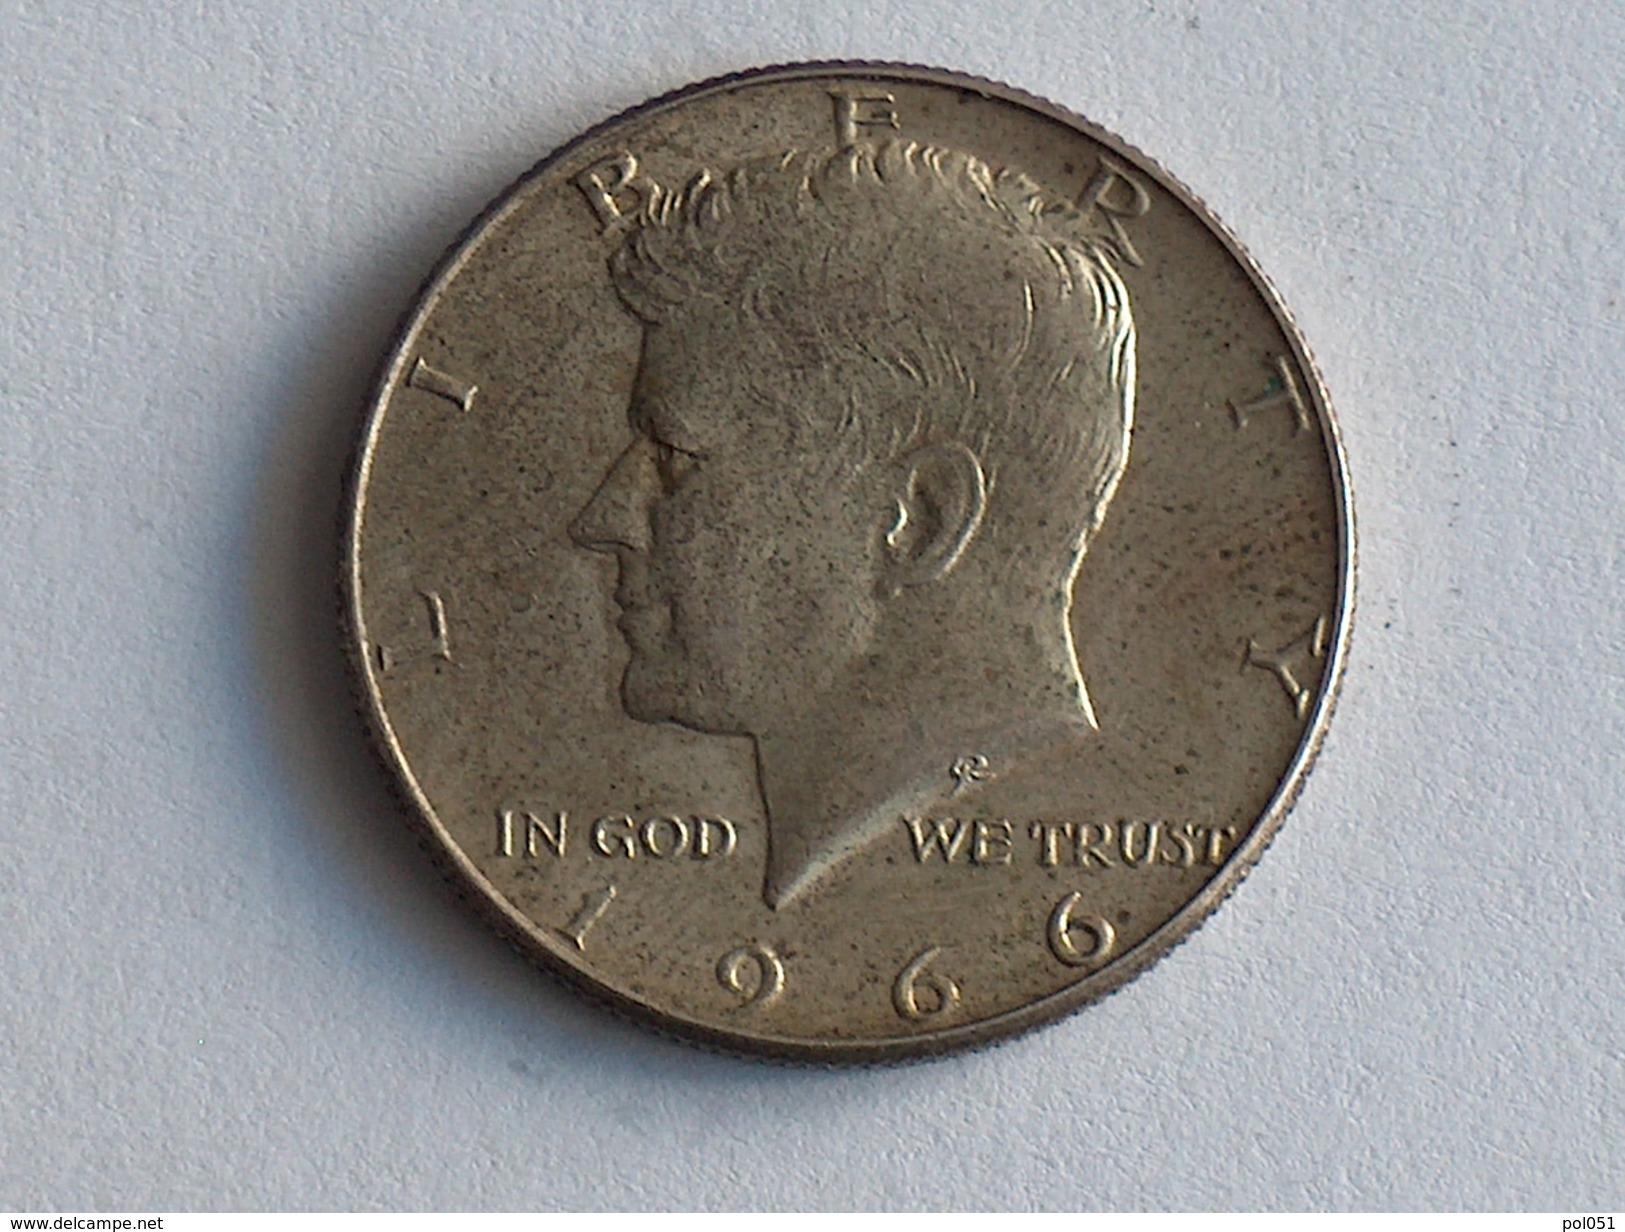 Etats-Unis, United States, USA - Half 1/2 Dollar 1966 1966P - KENNEDY - Silver, Argent - Federal Issues